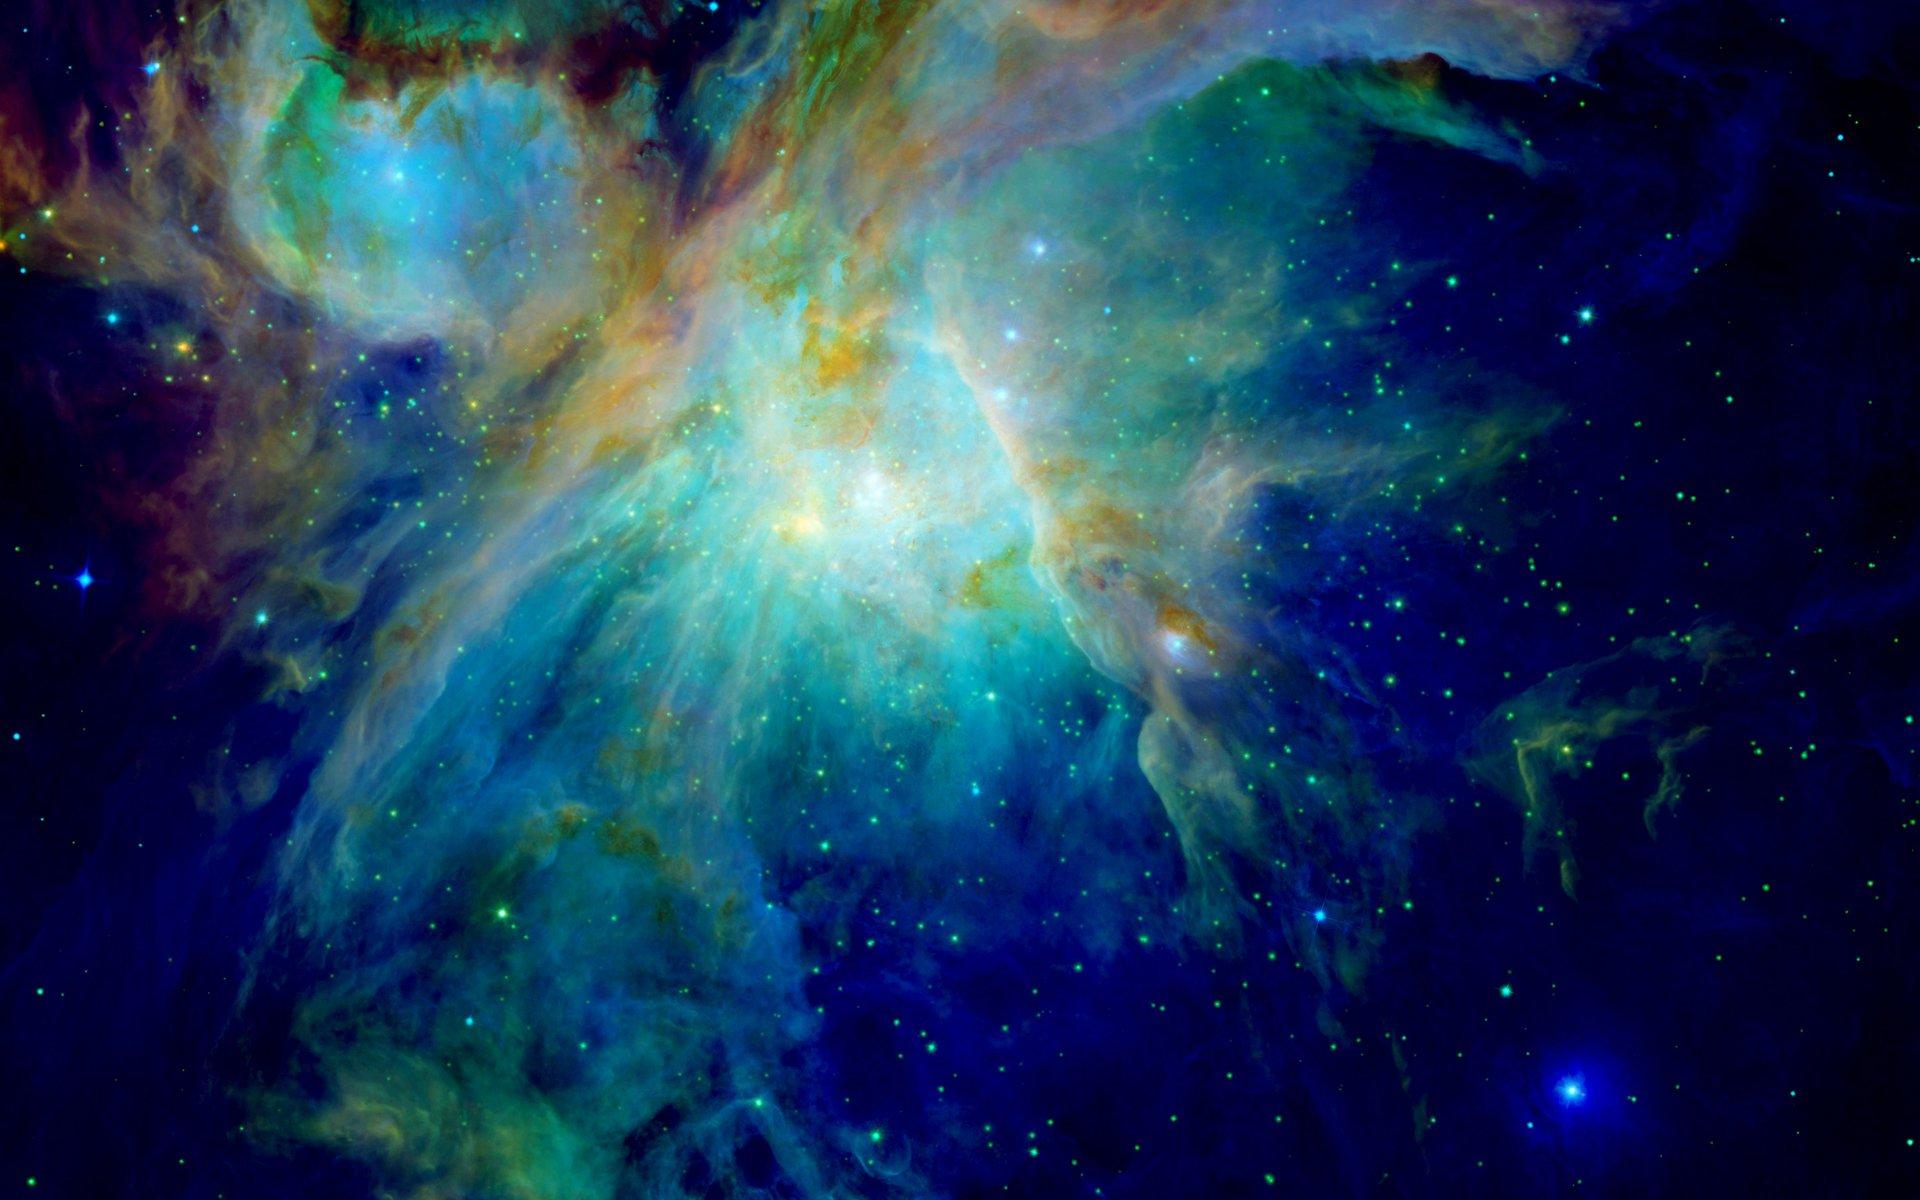 Orion Nebula wallpaper 149143 1920x1200